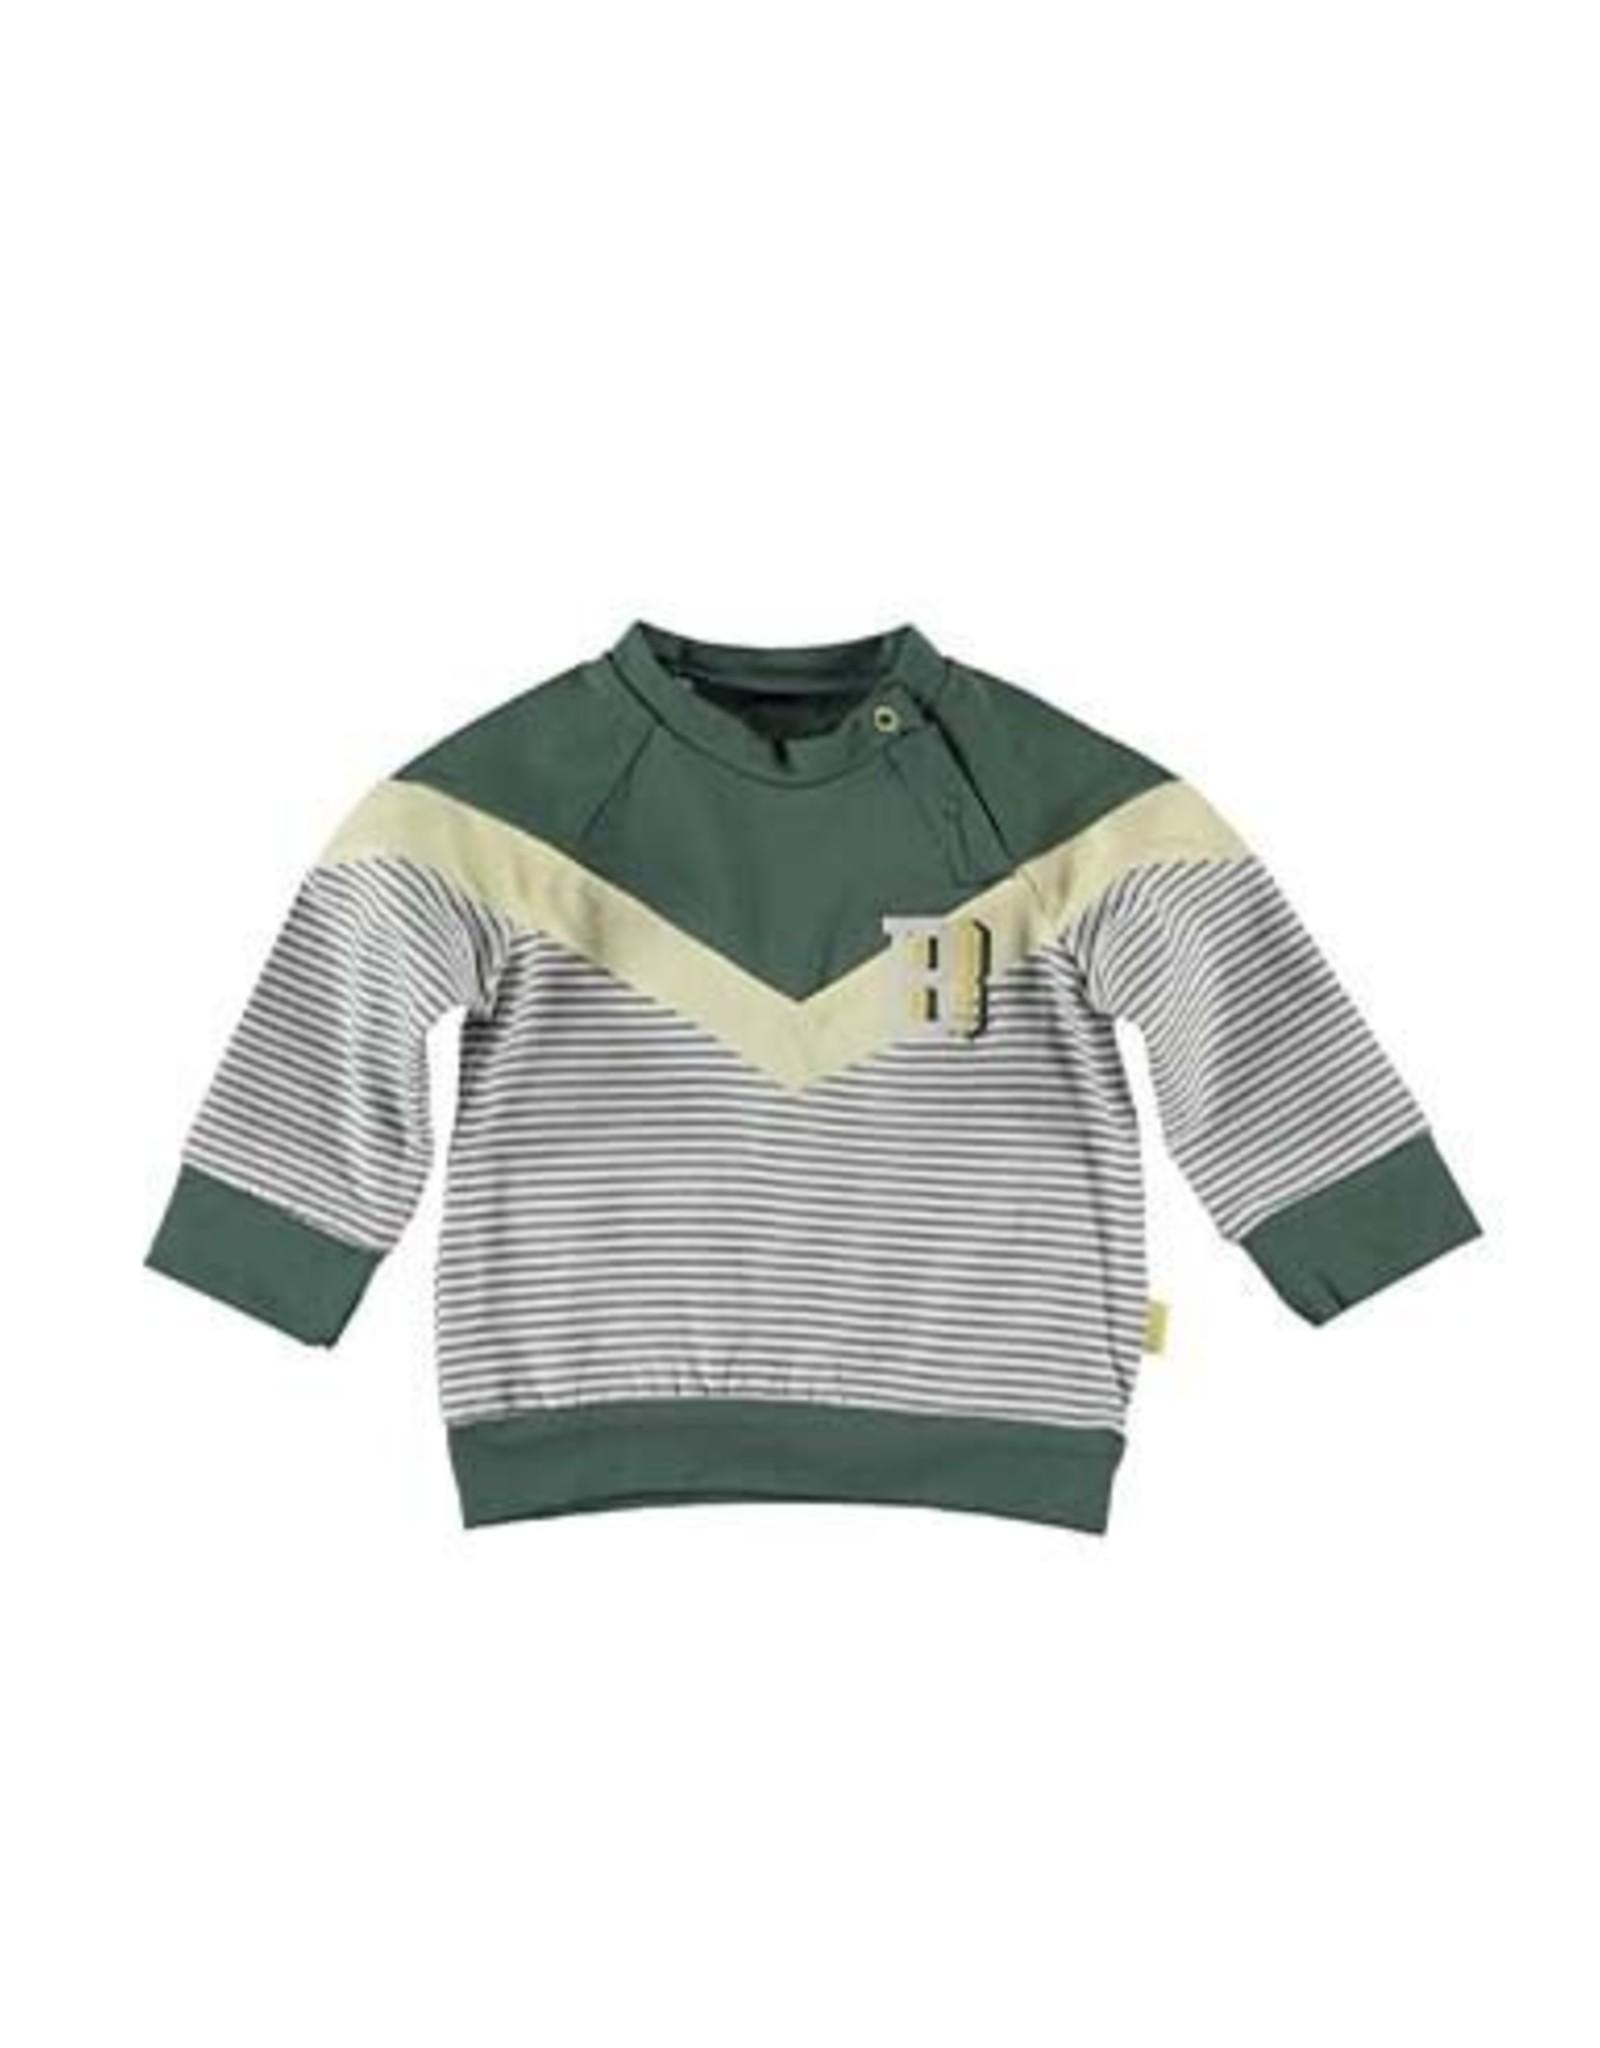 B.E.S.S. Sweater B, Yellow